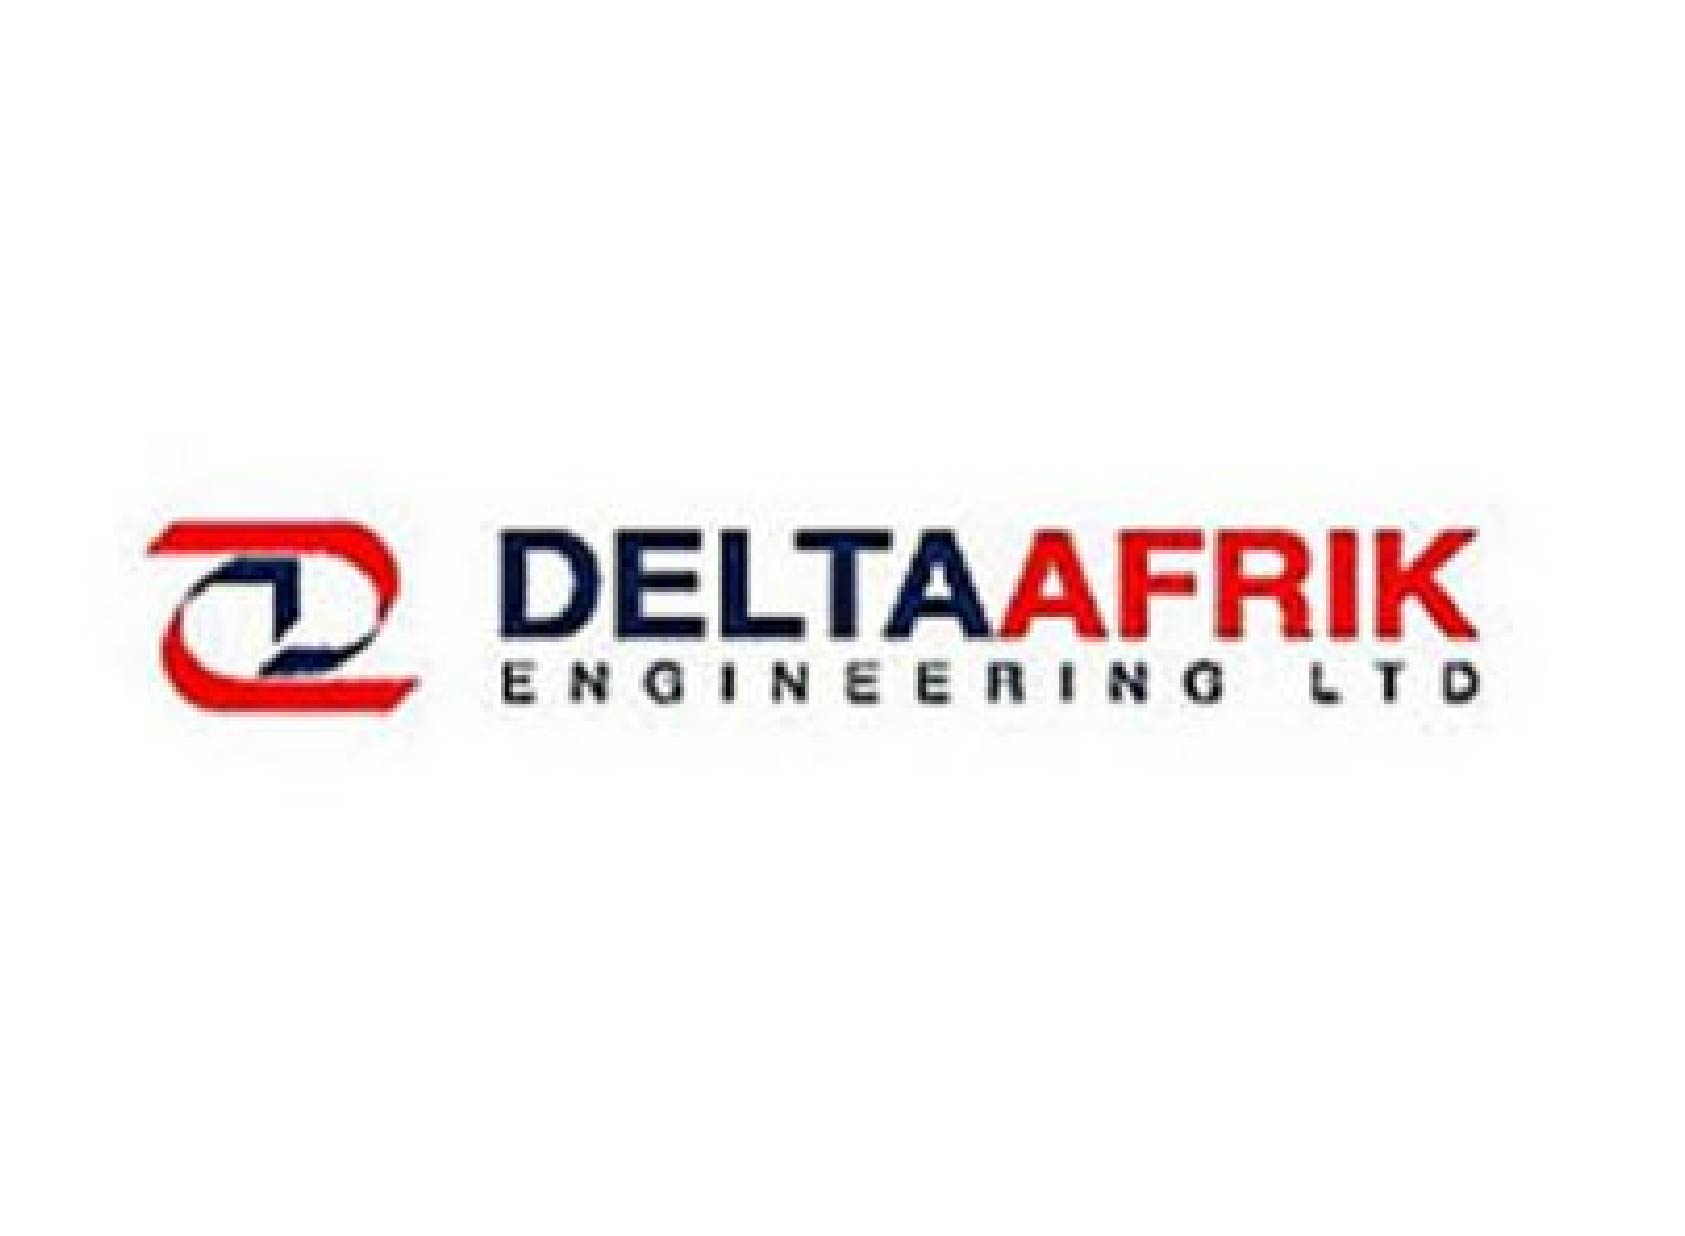 DeltaAfrik-01.jpg